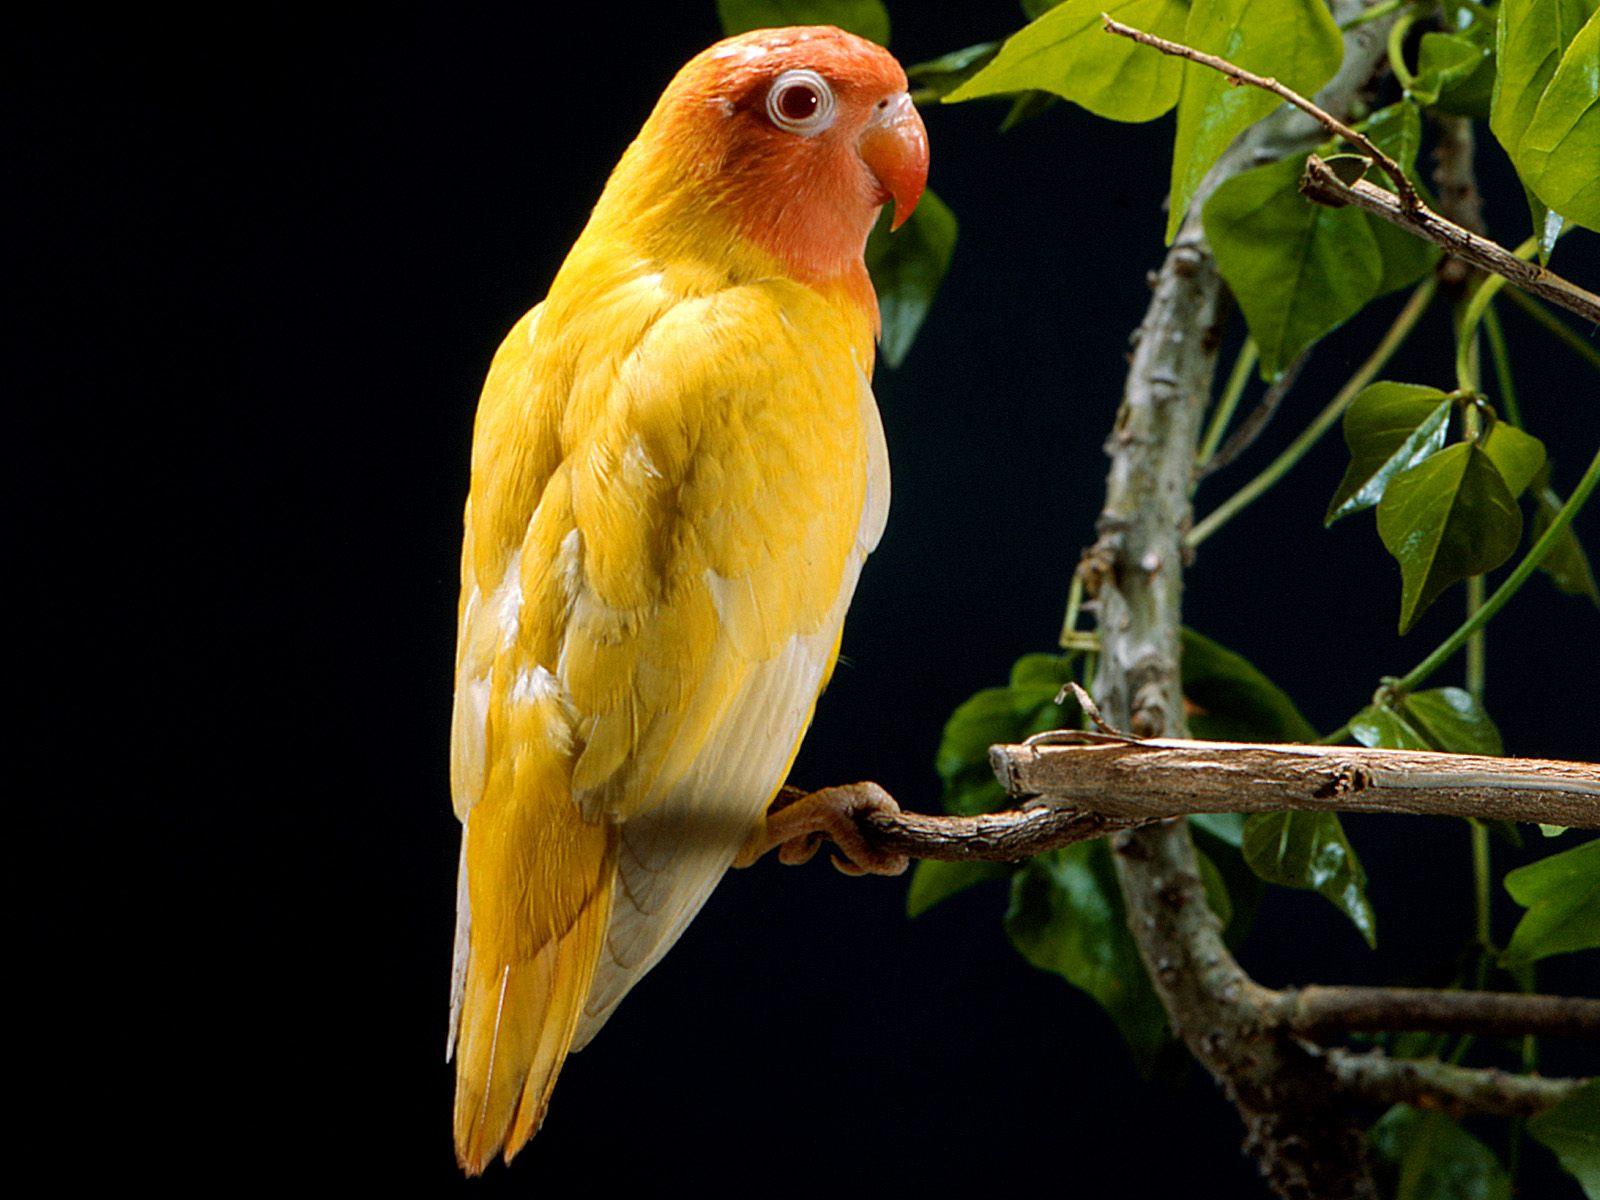 http://4.bp.blogspot.com/-VH-jFyCgG58/UAGGdc9bWdI/AAAAAAAADrc/gADVS-5ofZo/s1600/parrot008.jpg